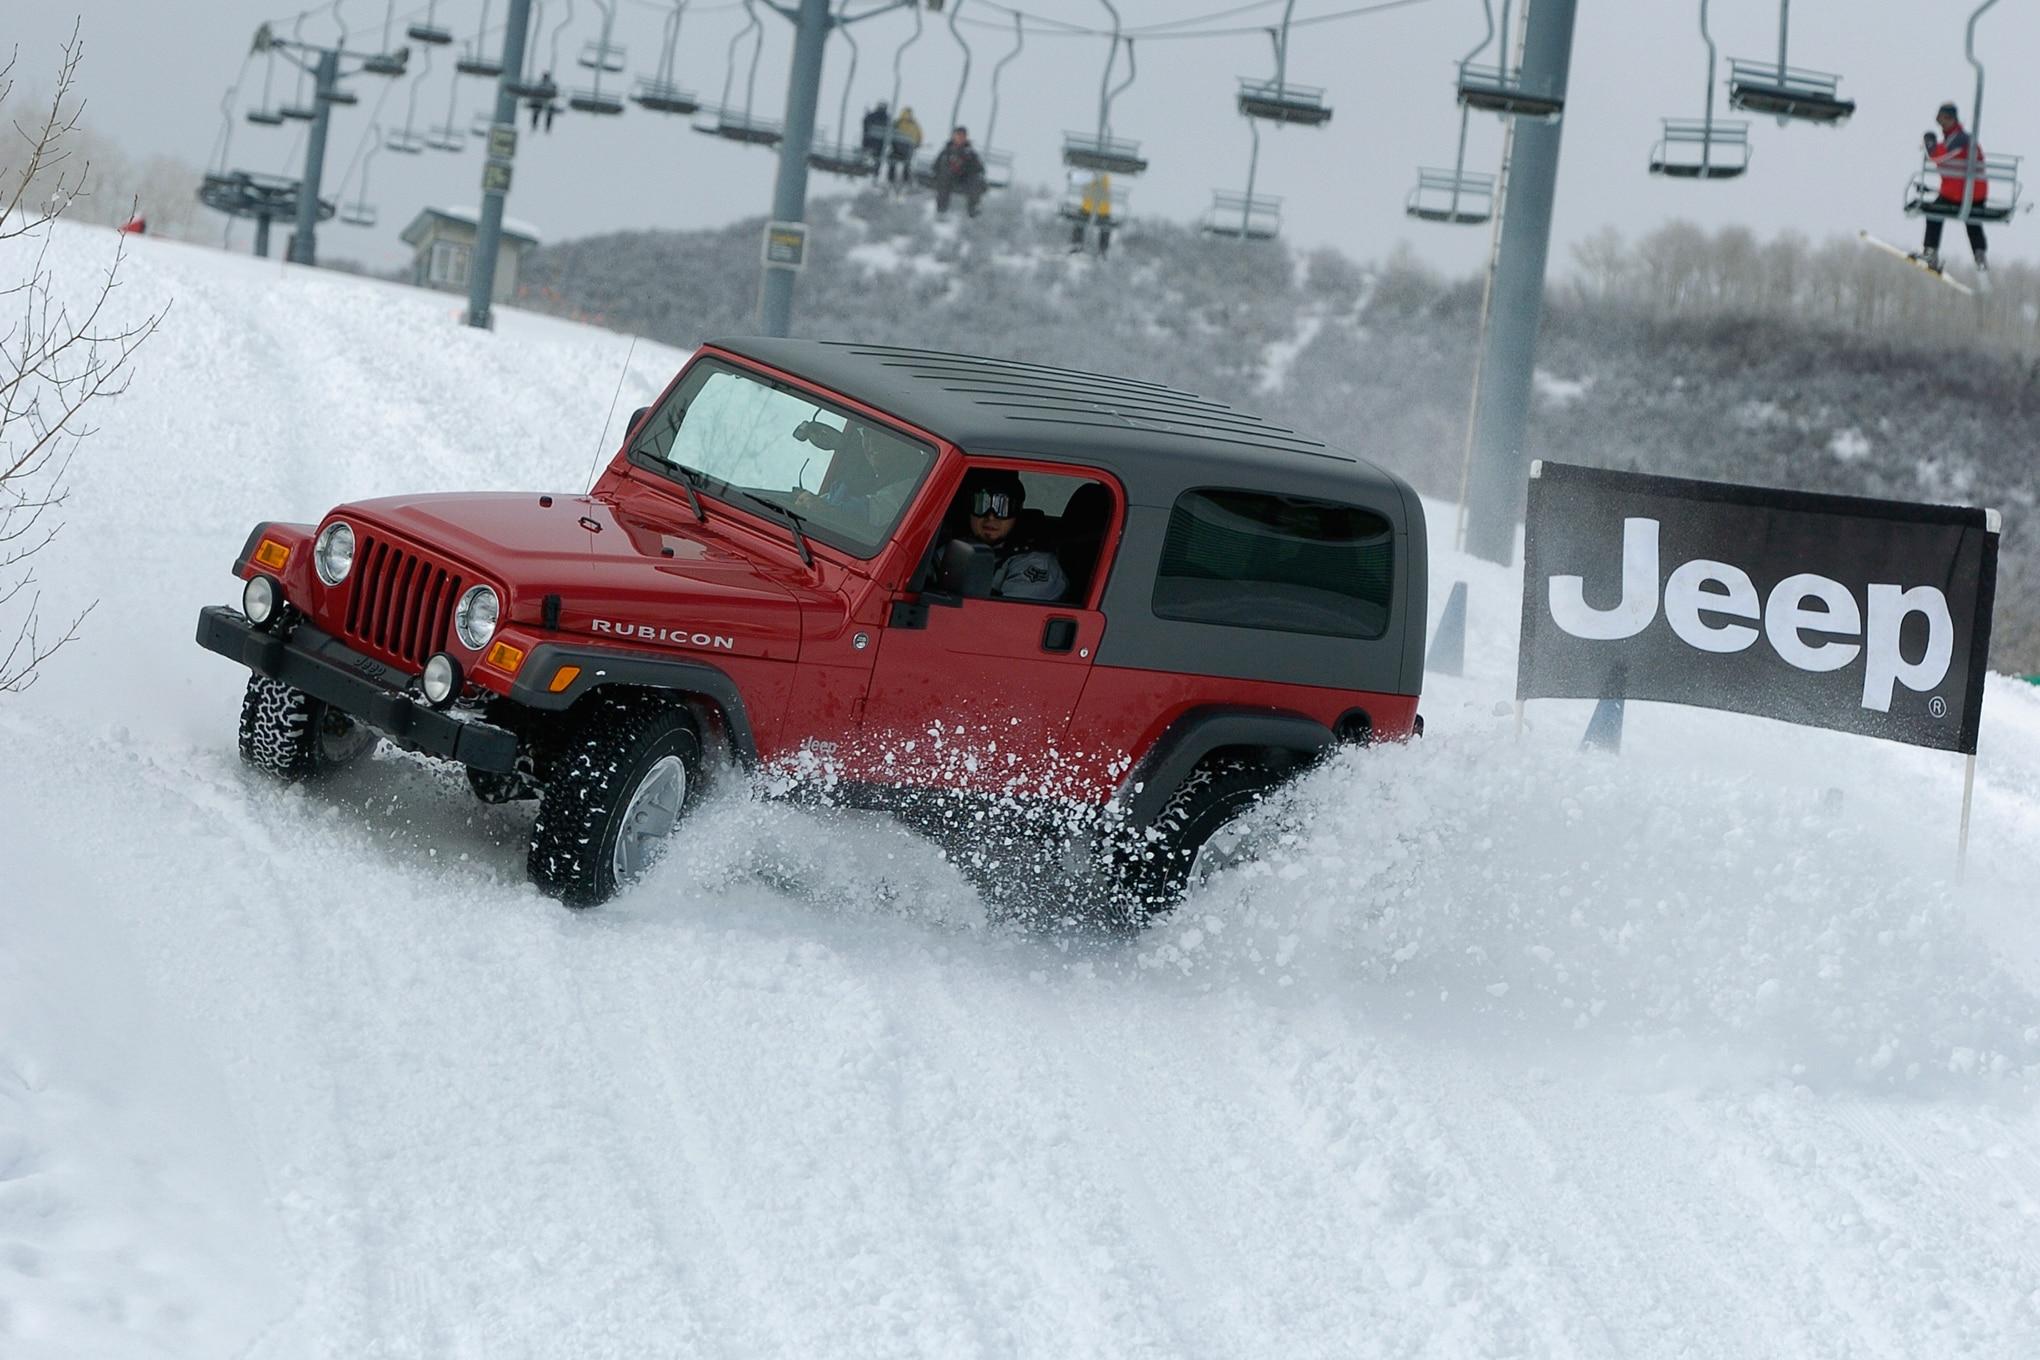 019 auto news jeep where the jeeps are event coverage 1608